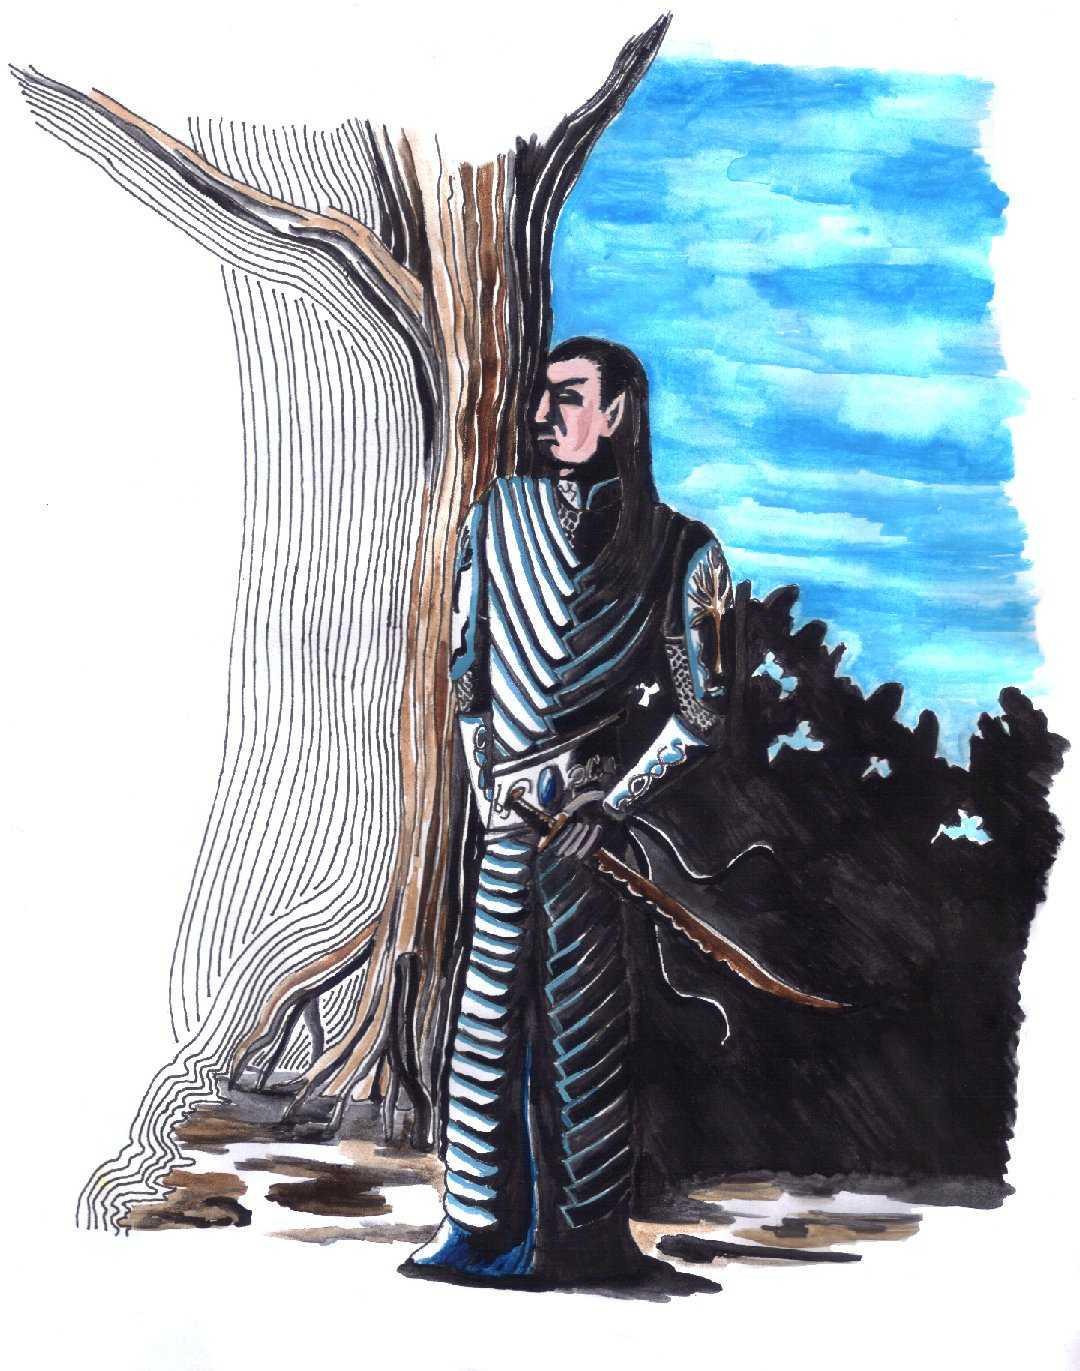 http://fc02.deviantart.com/fs5/i/2004/362/c/d/Noldor_Warrior_by_Blakey00.jpg